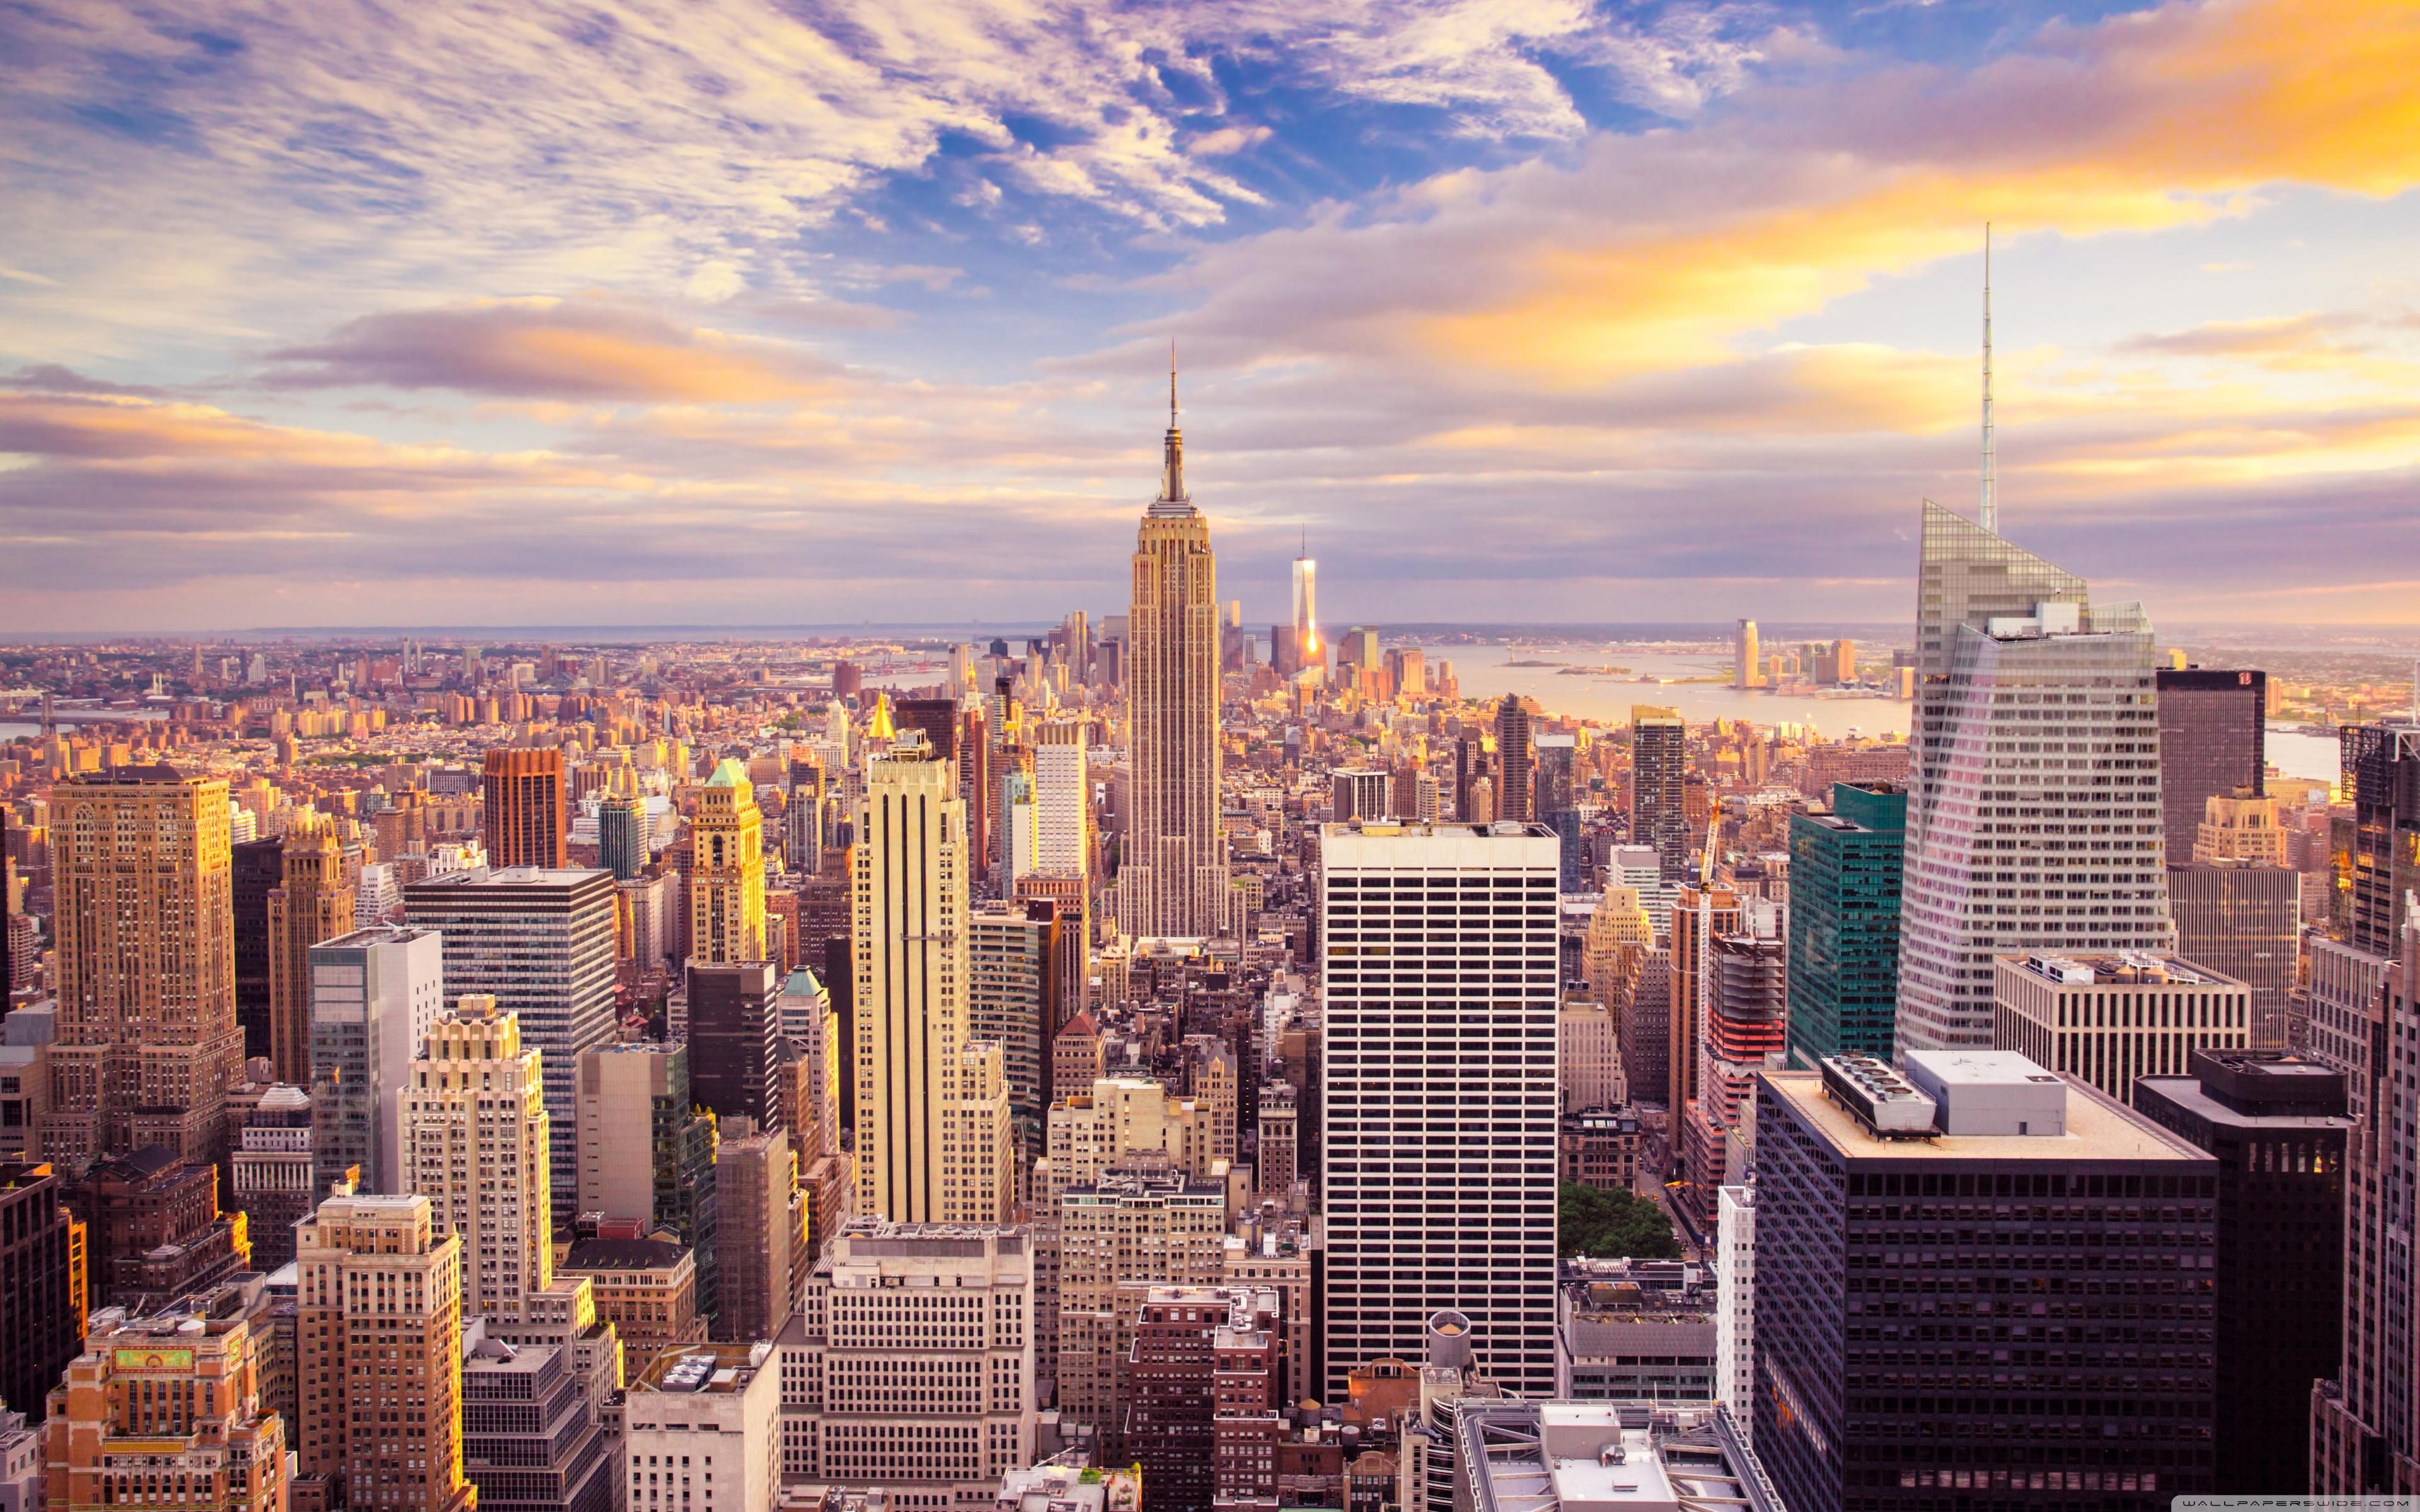 New York City Buildings 4K HD Desktop Wallpaper for 4K Ultra HD 3840x2400